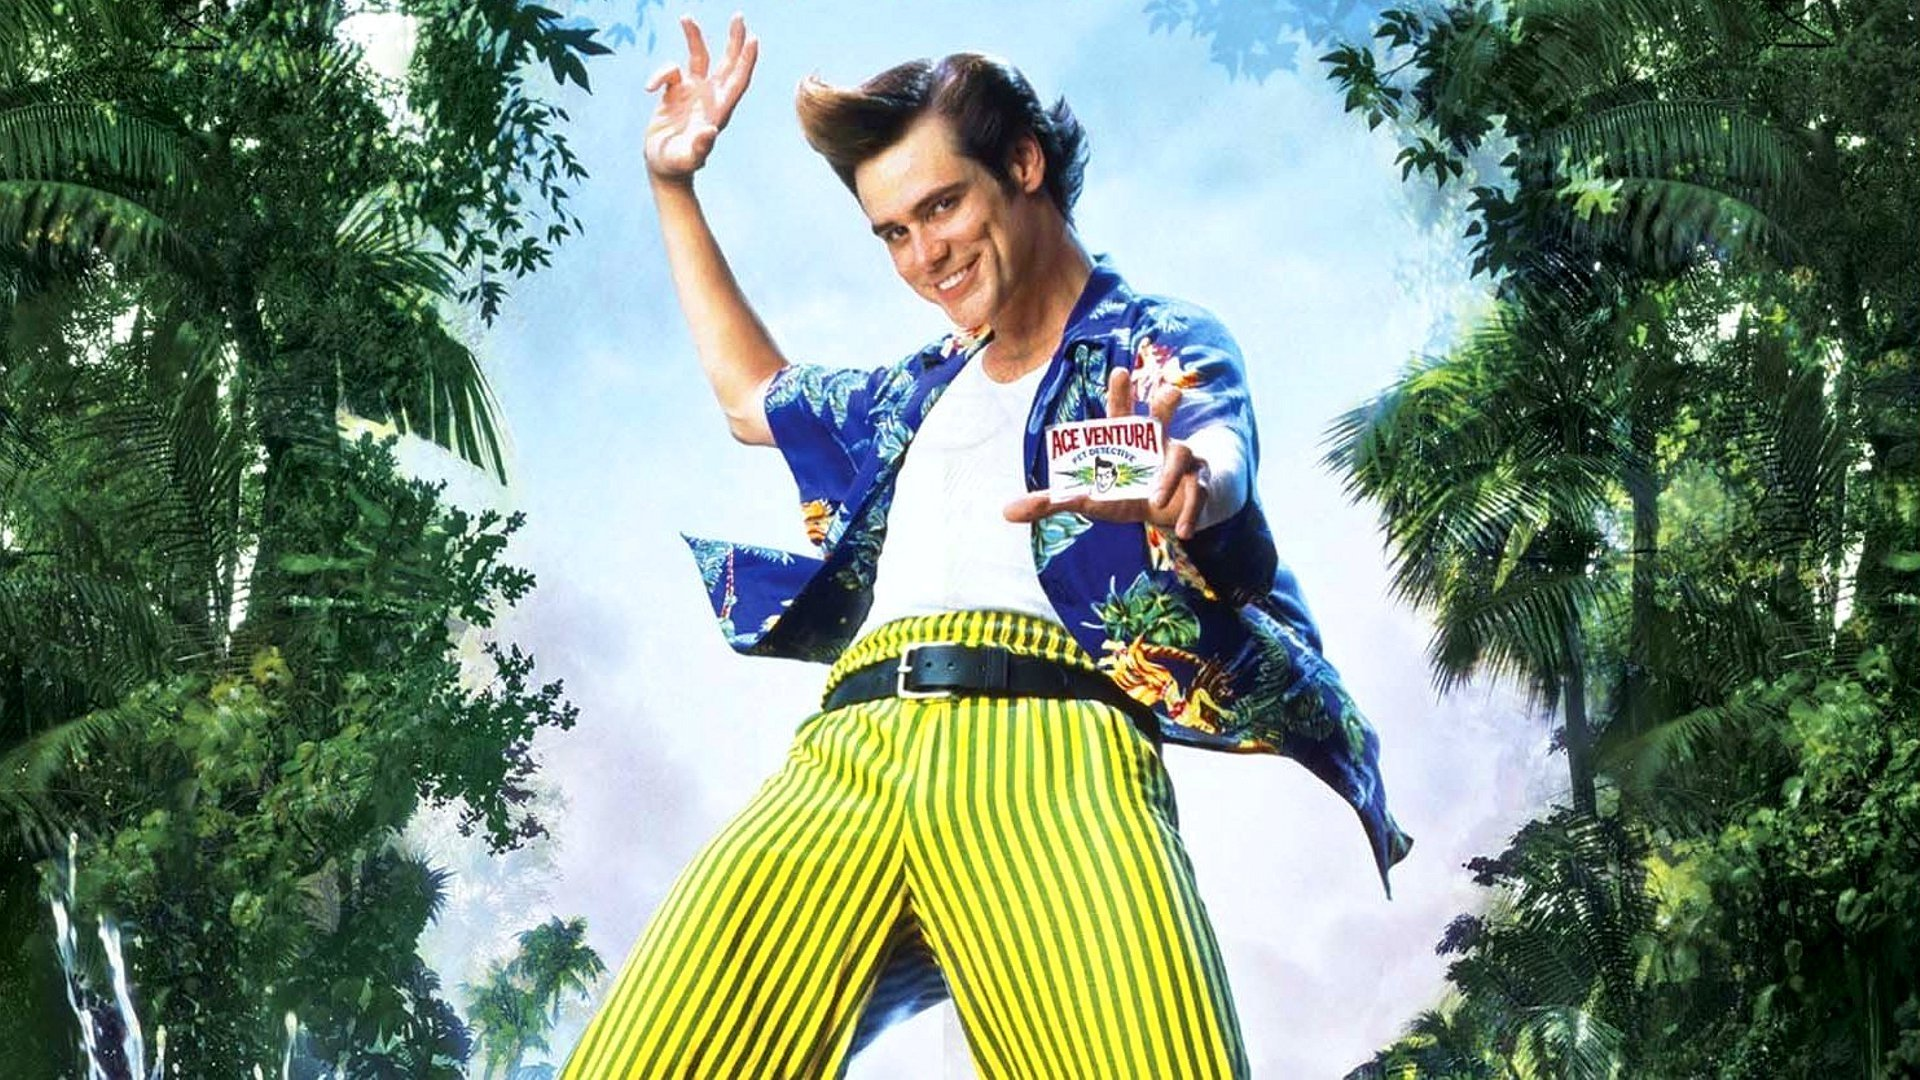 Ace Ventura: When Nature Calls - Official Site - Miramax